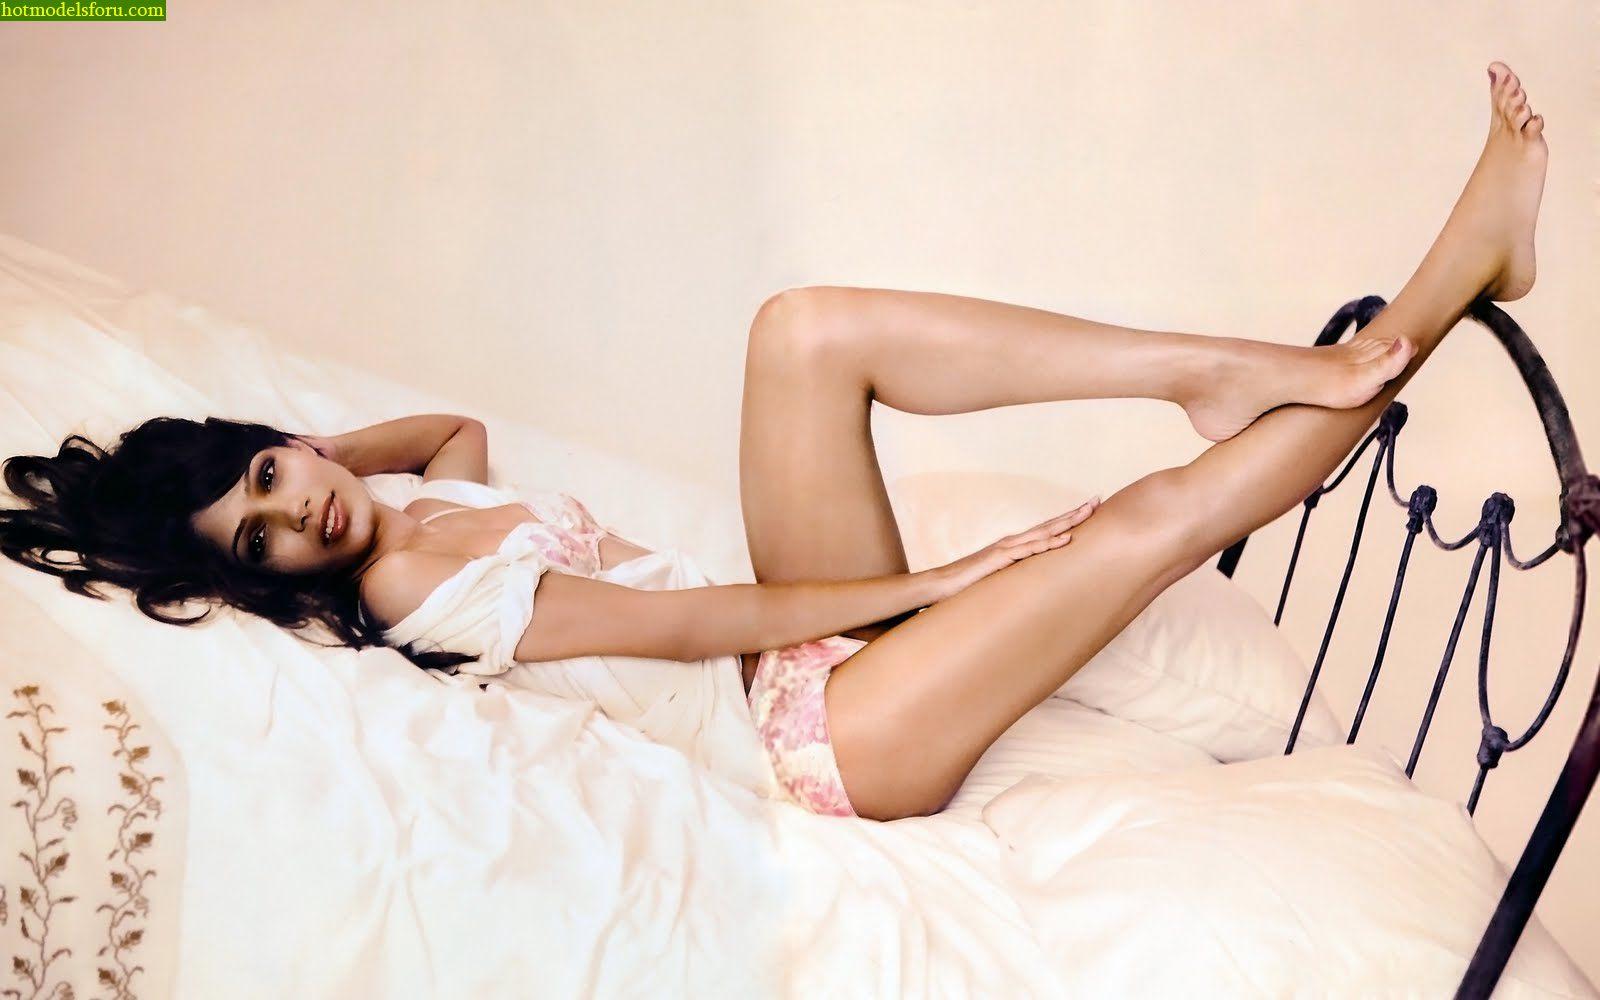 http://4.bp.blogspot.com/-1efFE7S9wHE/TardHPydMQI/AAAAAAAAAOU/2x_i7UoWBEA/s1600/Hot+Freida+Pinto+Slum+dog+millionaire+jai+ho+Hot+Hollywood+Actress+Hot+lips+hot+legs++1.jpg